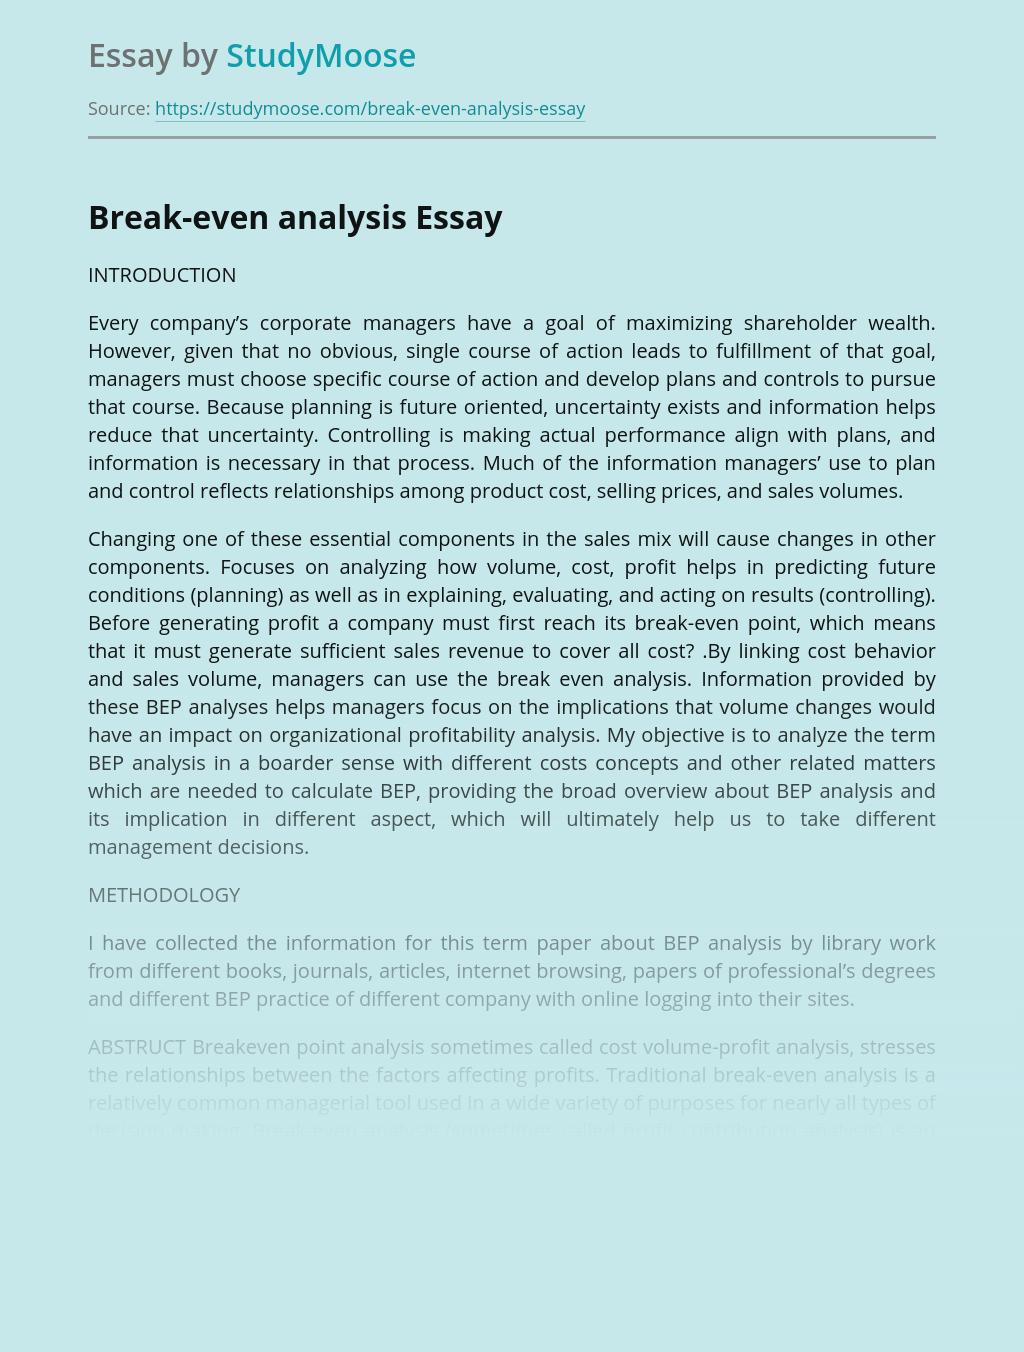 Characteristics of Break-Even Analysis